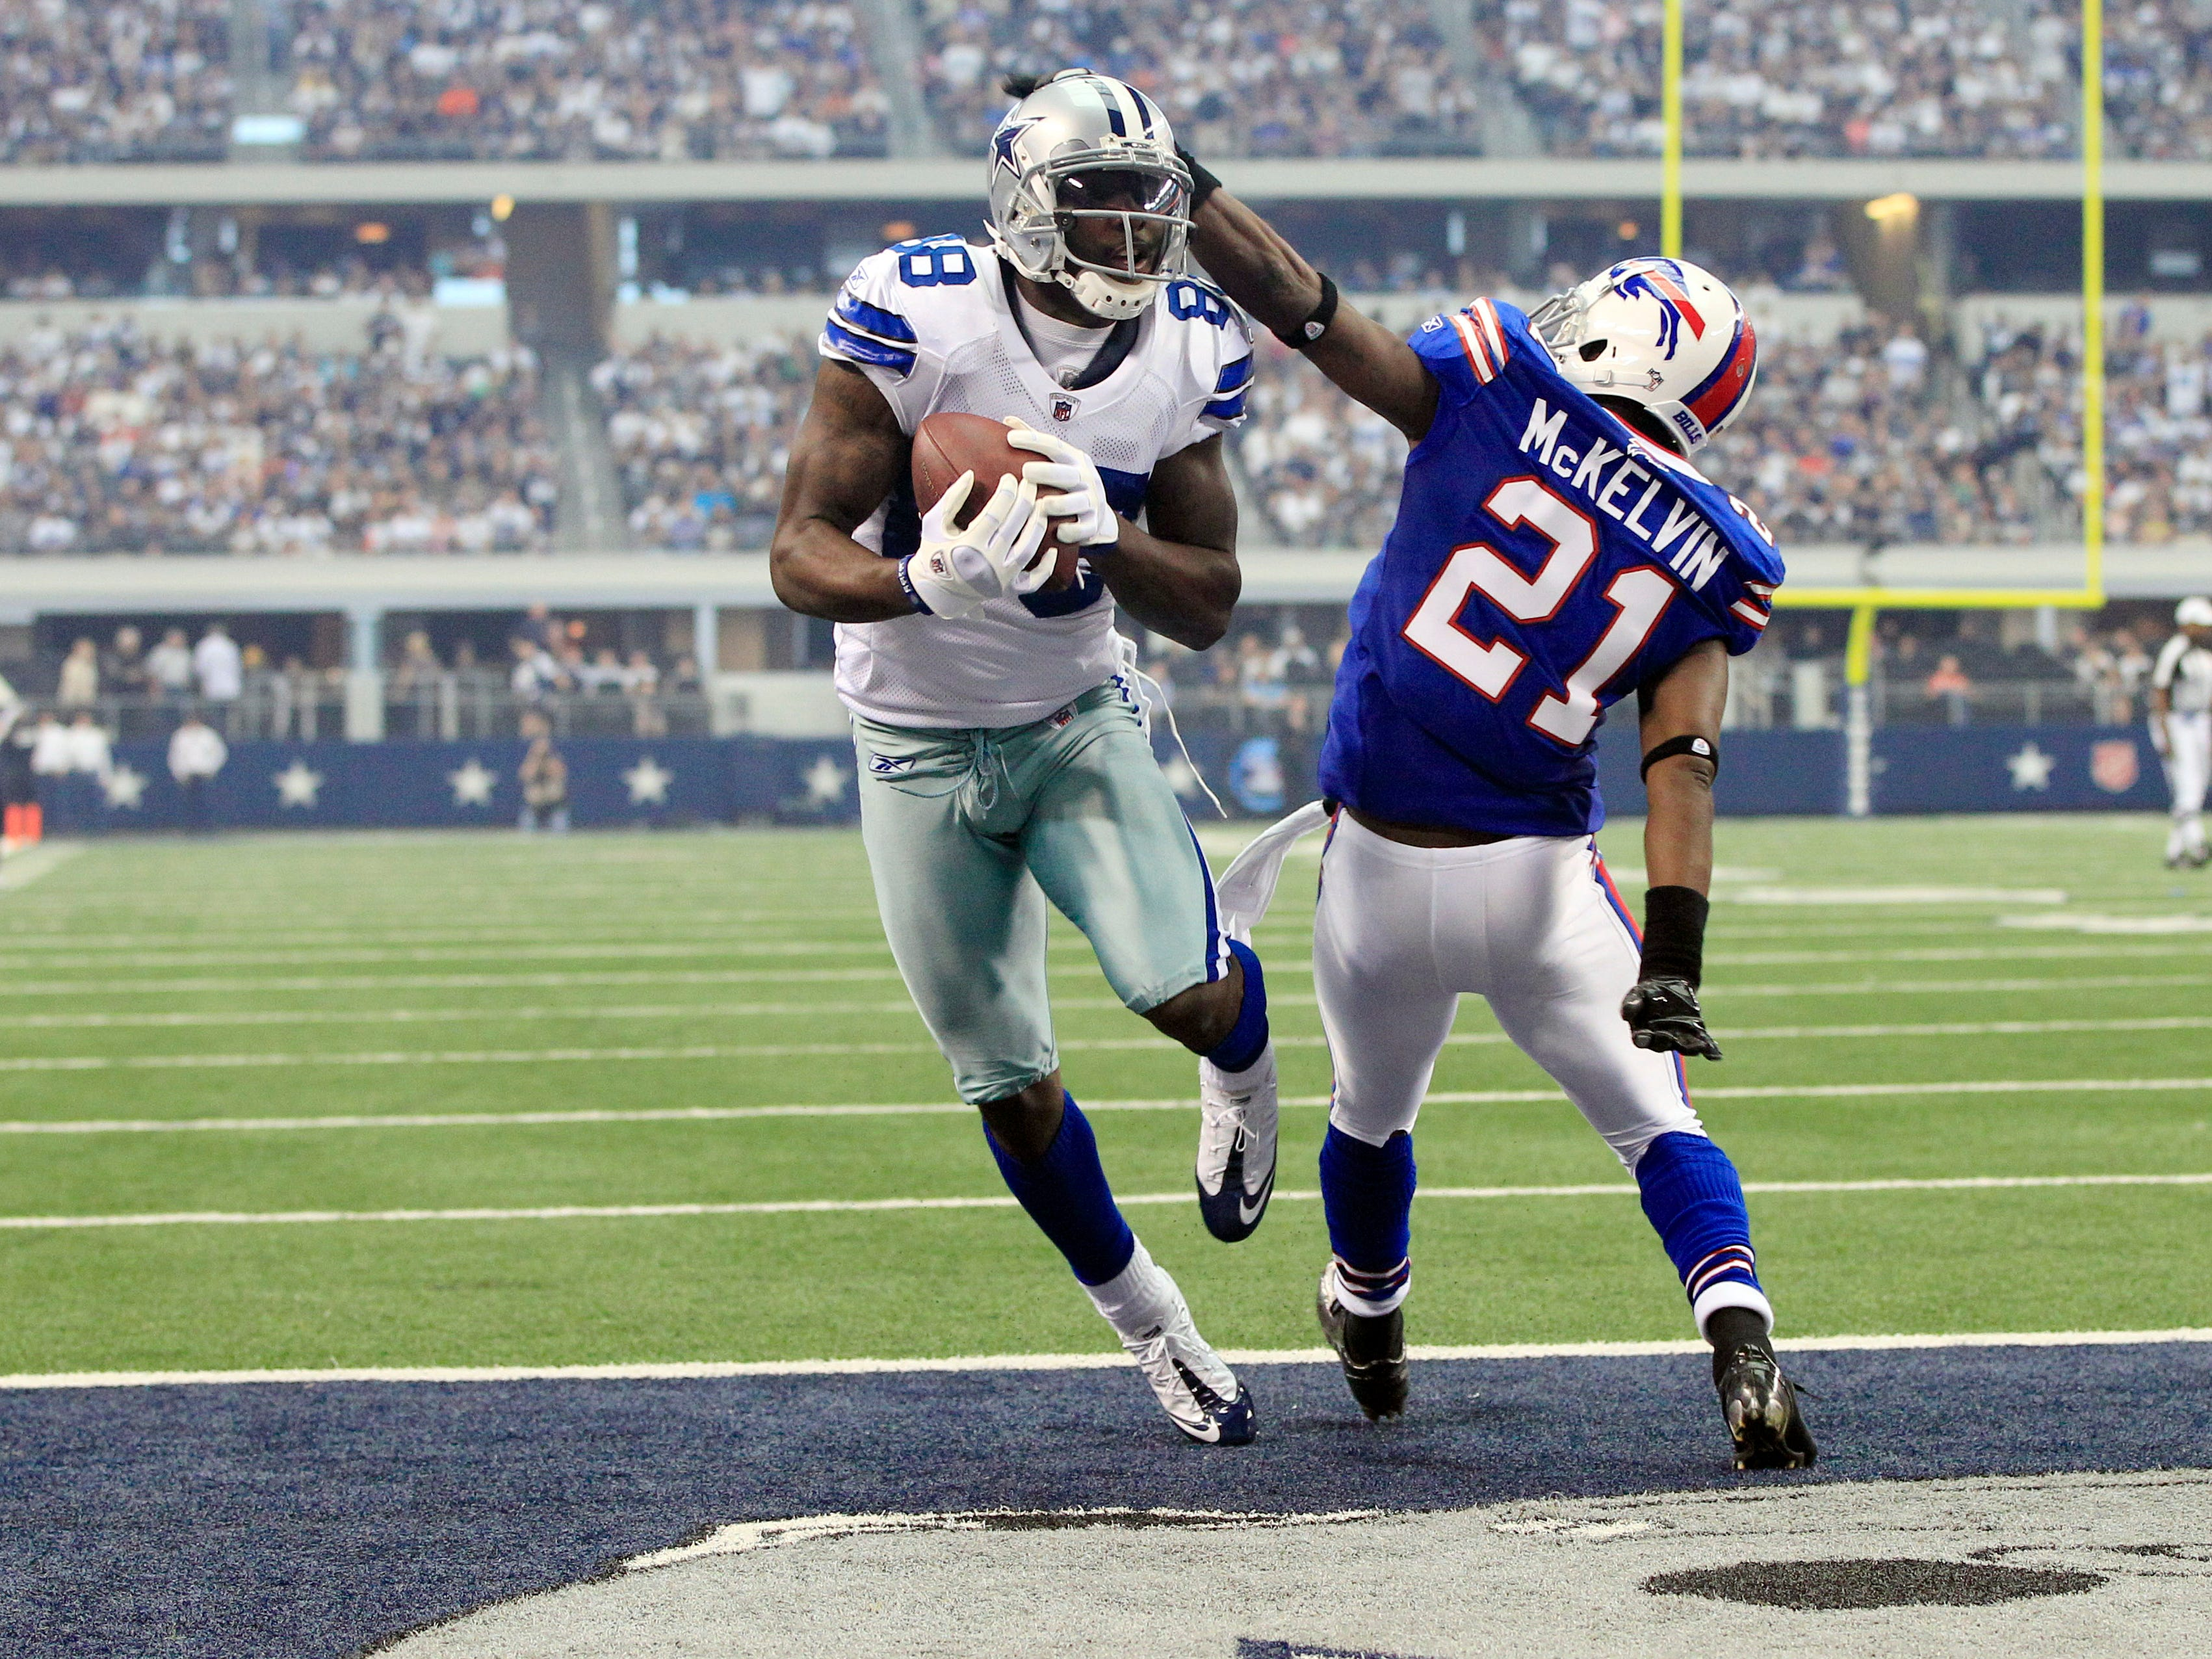 Dez Bryant makes a touchdown reception as Buffalo Bills' Leodis McKelvin defends in 2011.